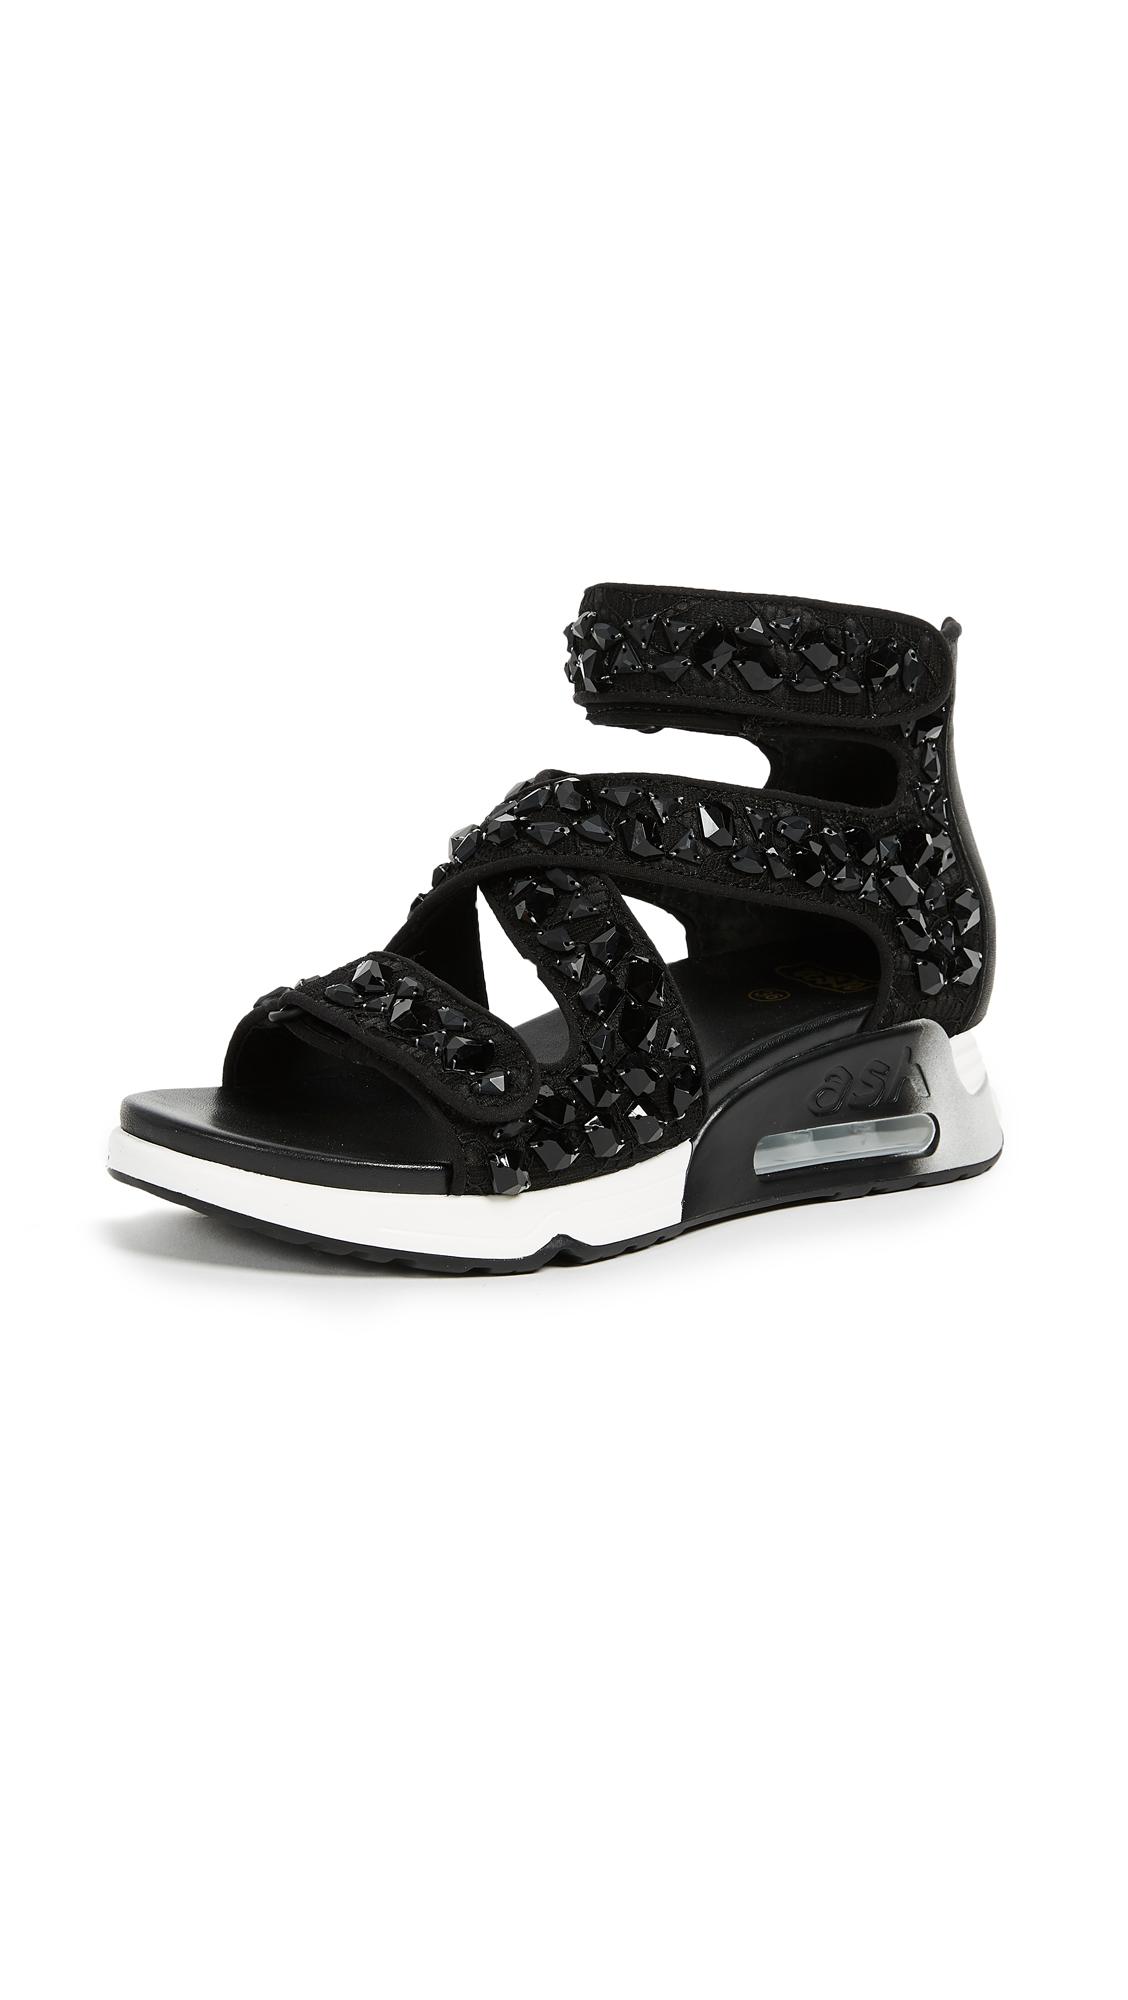 Ash Lips Stones Sandals - Black/Black